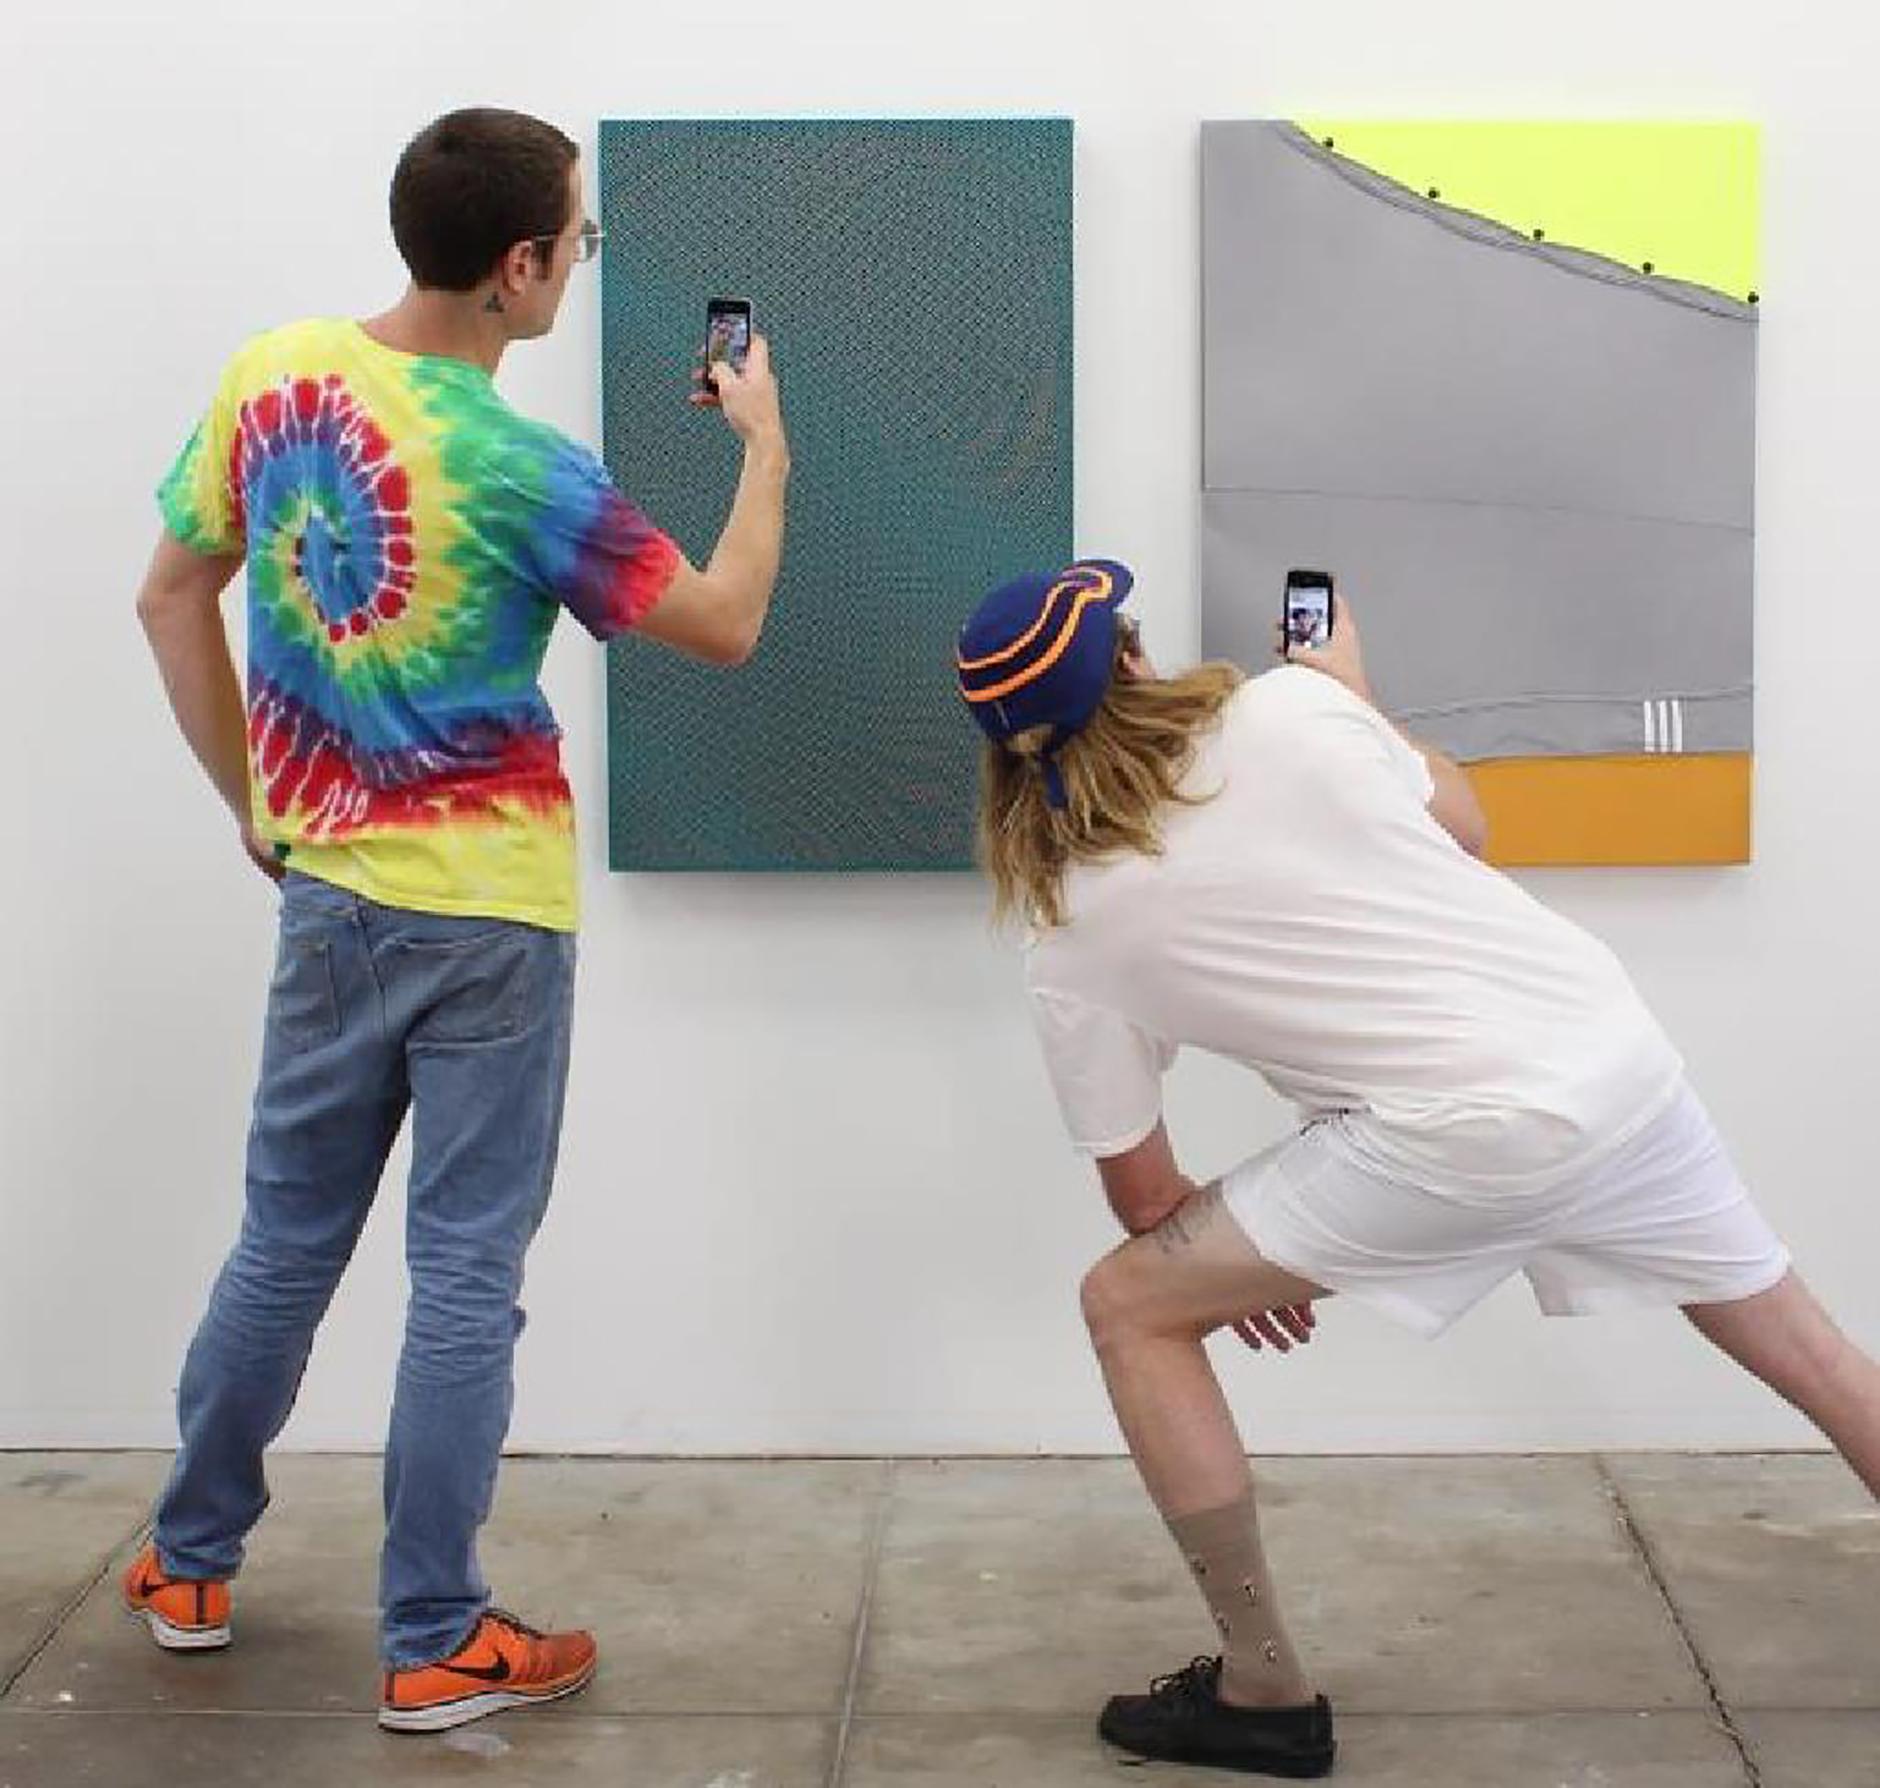 Jonathan Zawada and Ben Barretto, 100% Potential, 2014, Los Angeles